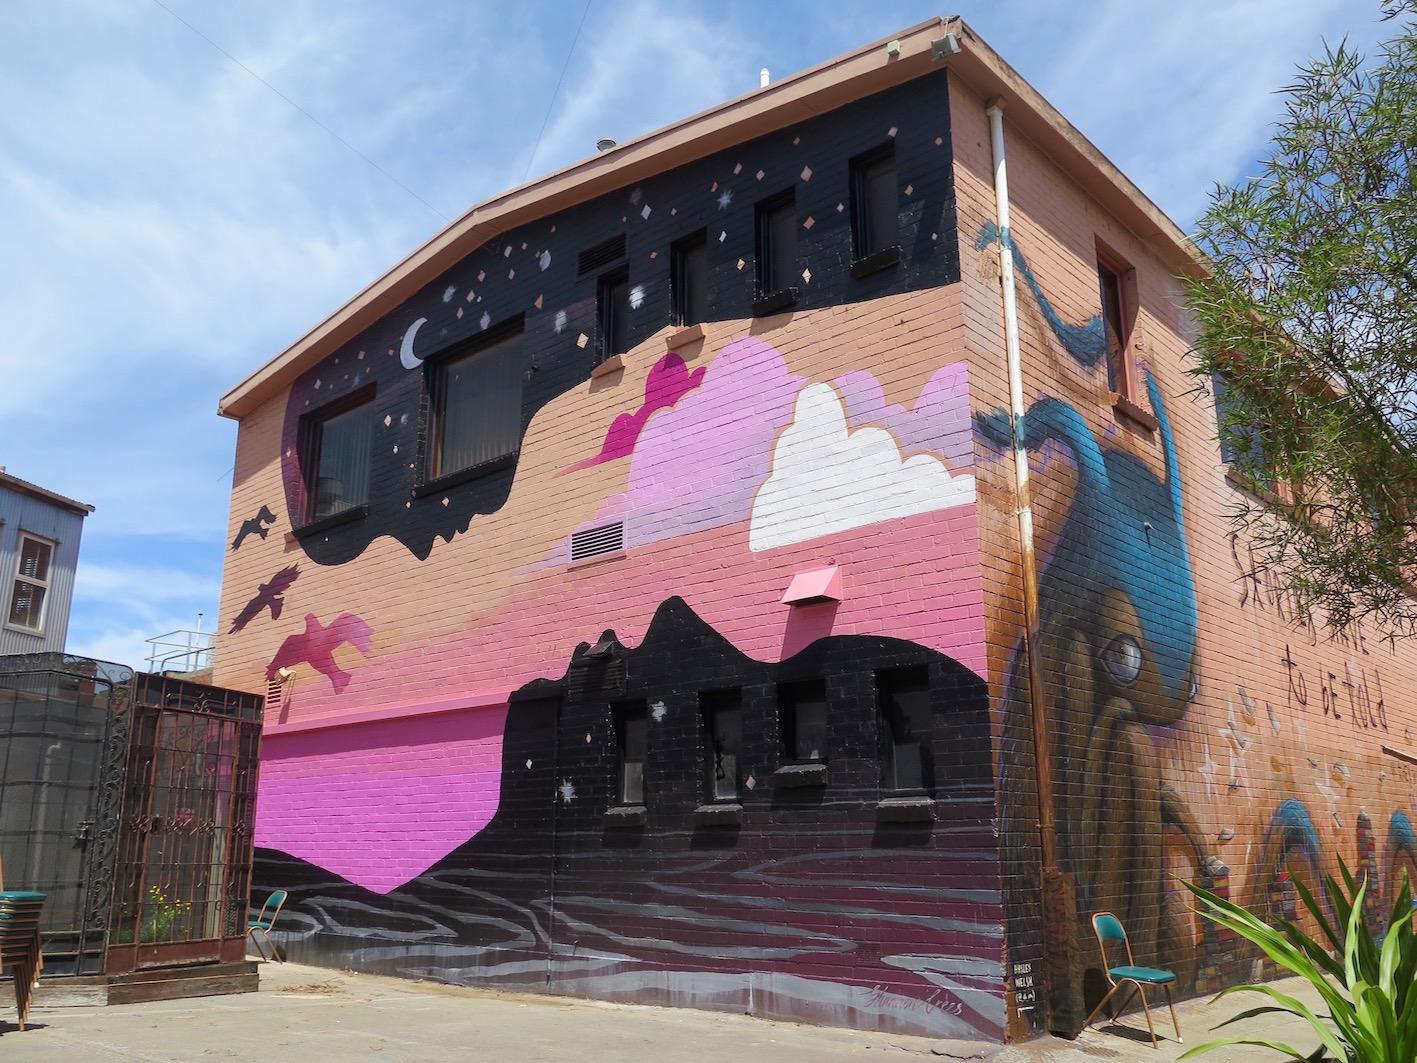 deansunshine_landofsunshine_melbourne_streetart_graffiti_eastland urban art project 11 shannon crees